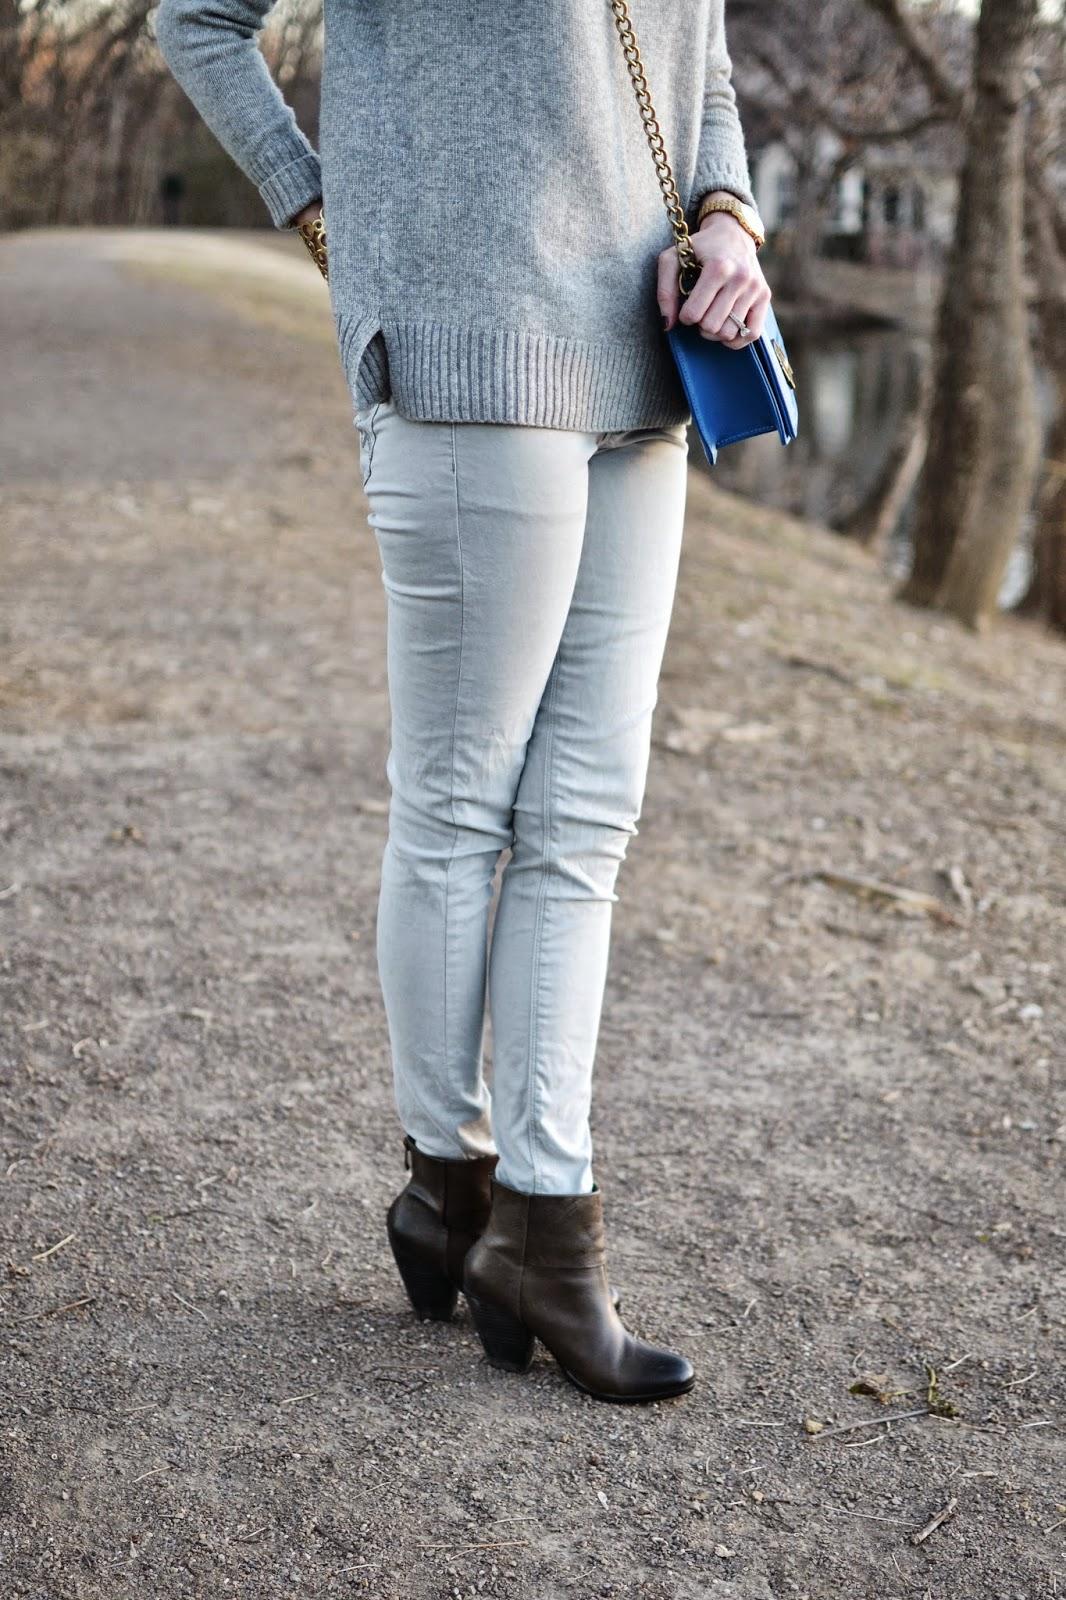 grey turtleneck sweater, grey jeans, grey booties, blue purse, gold jewelry